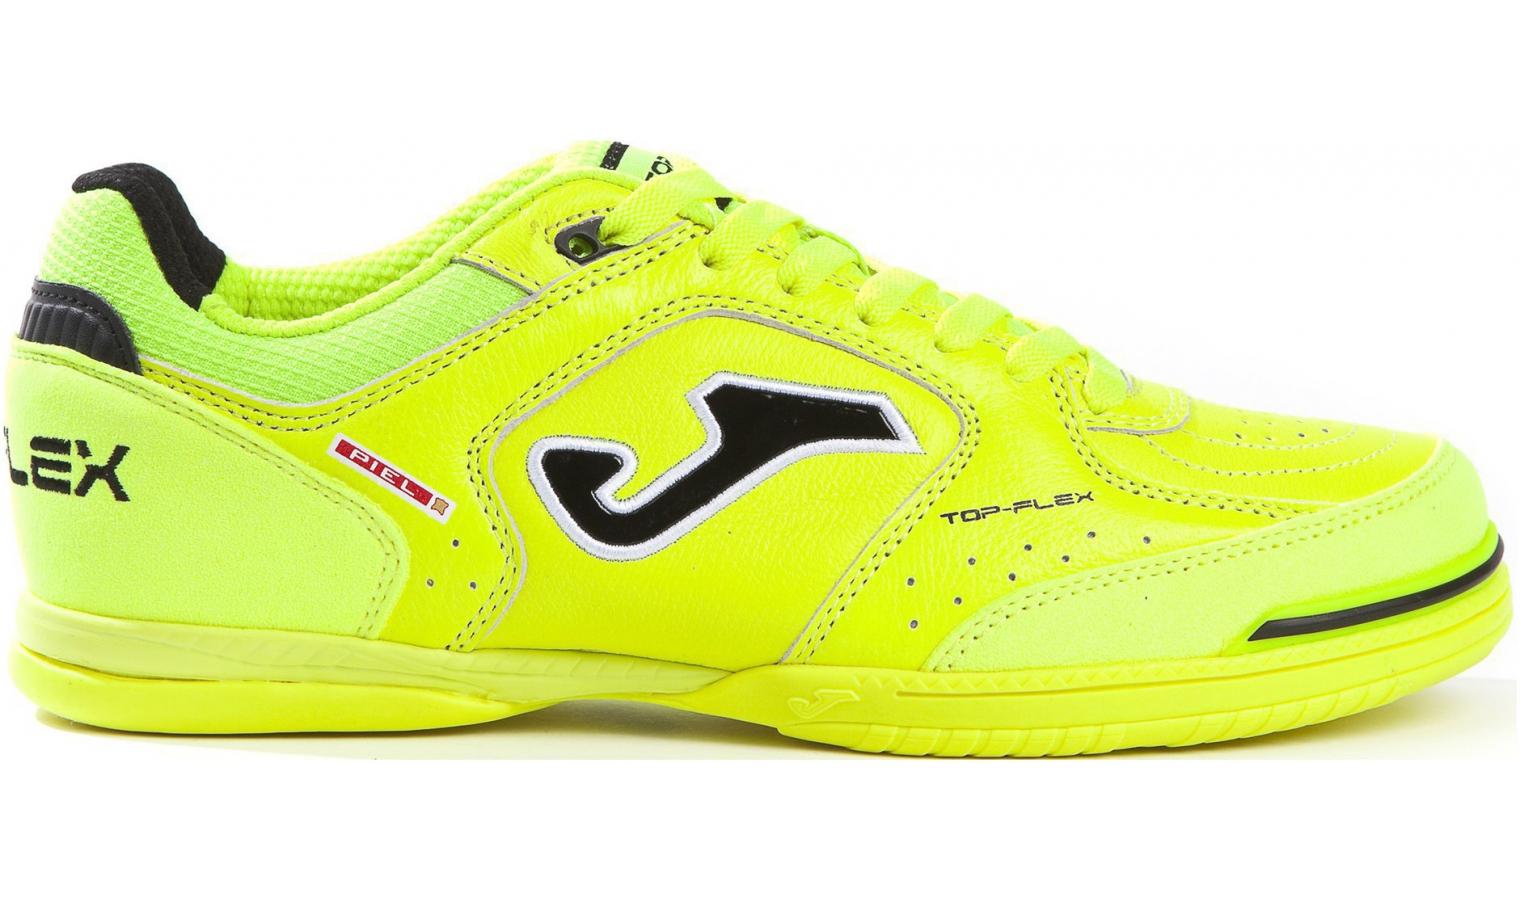 8a7323f4b Sálovky Joma TOP FLEX 811 žluté | AD Sport.cz